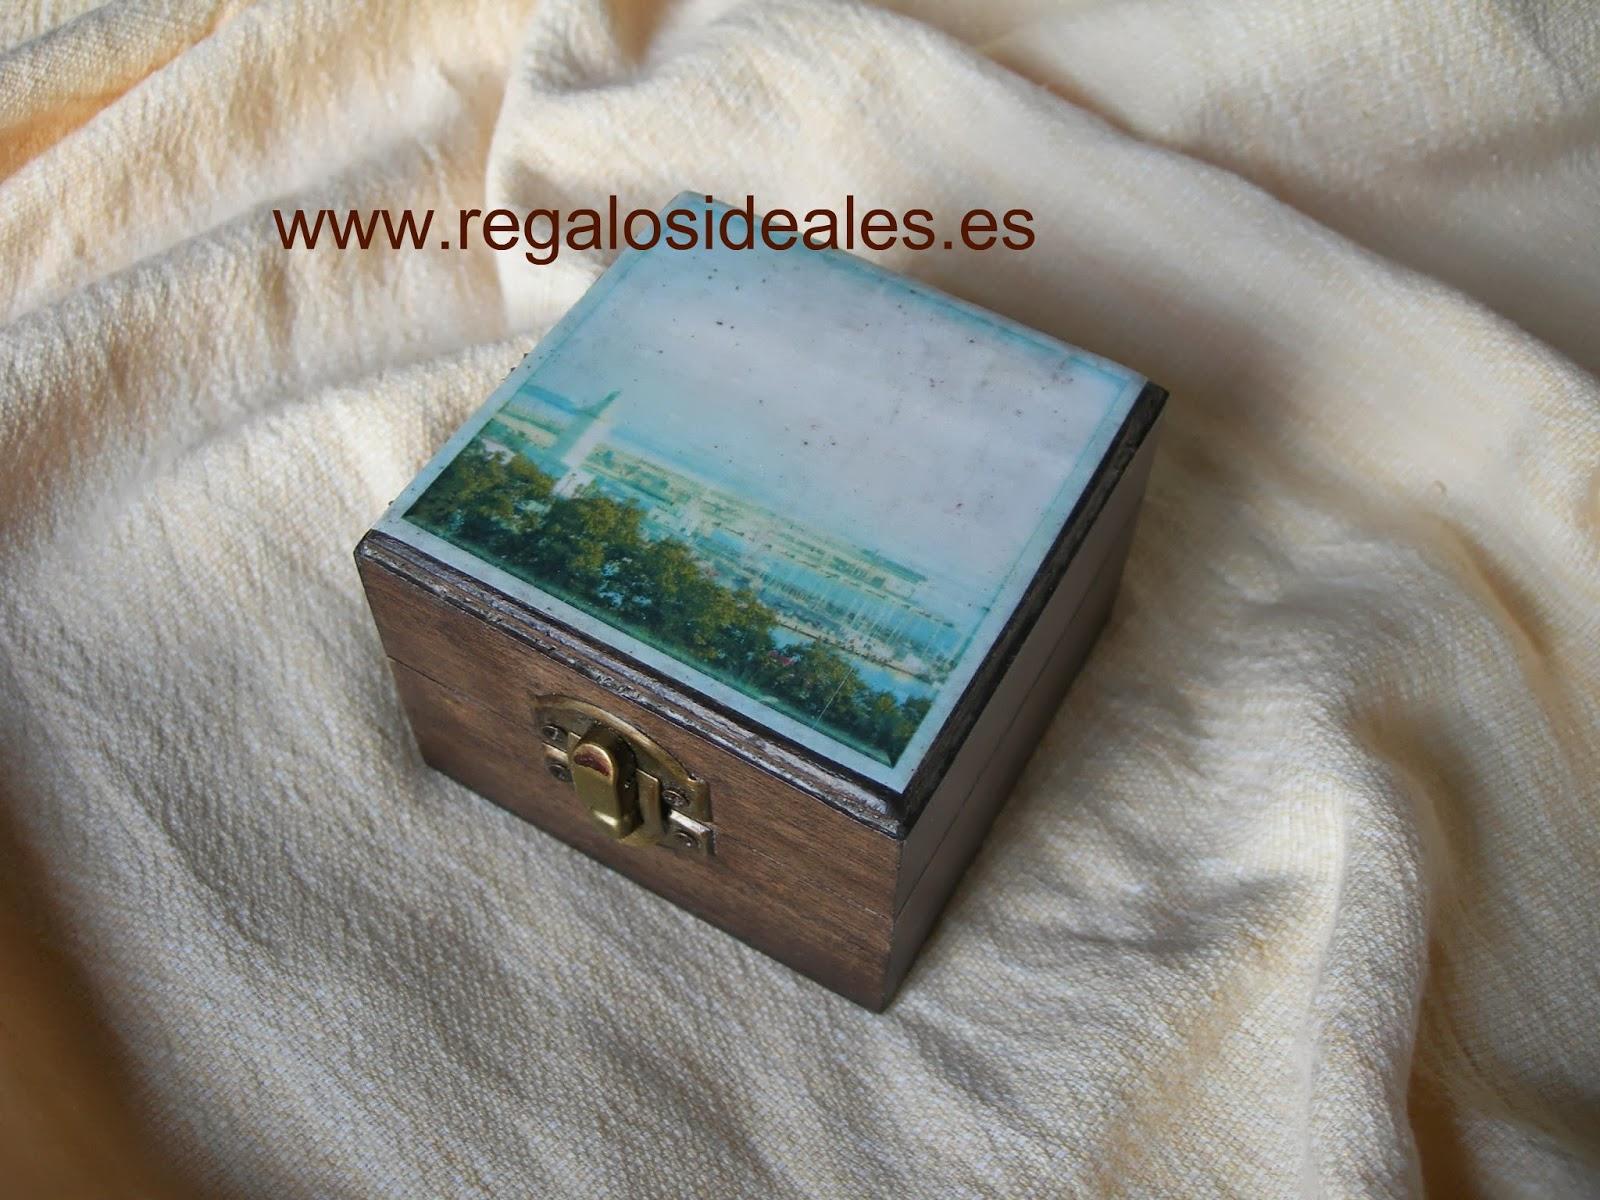 Regalos ideales cajas decoradas a mano - Cajas decoradas a mano ...